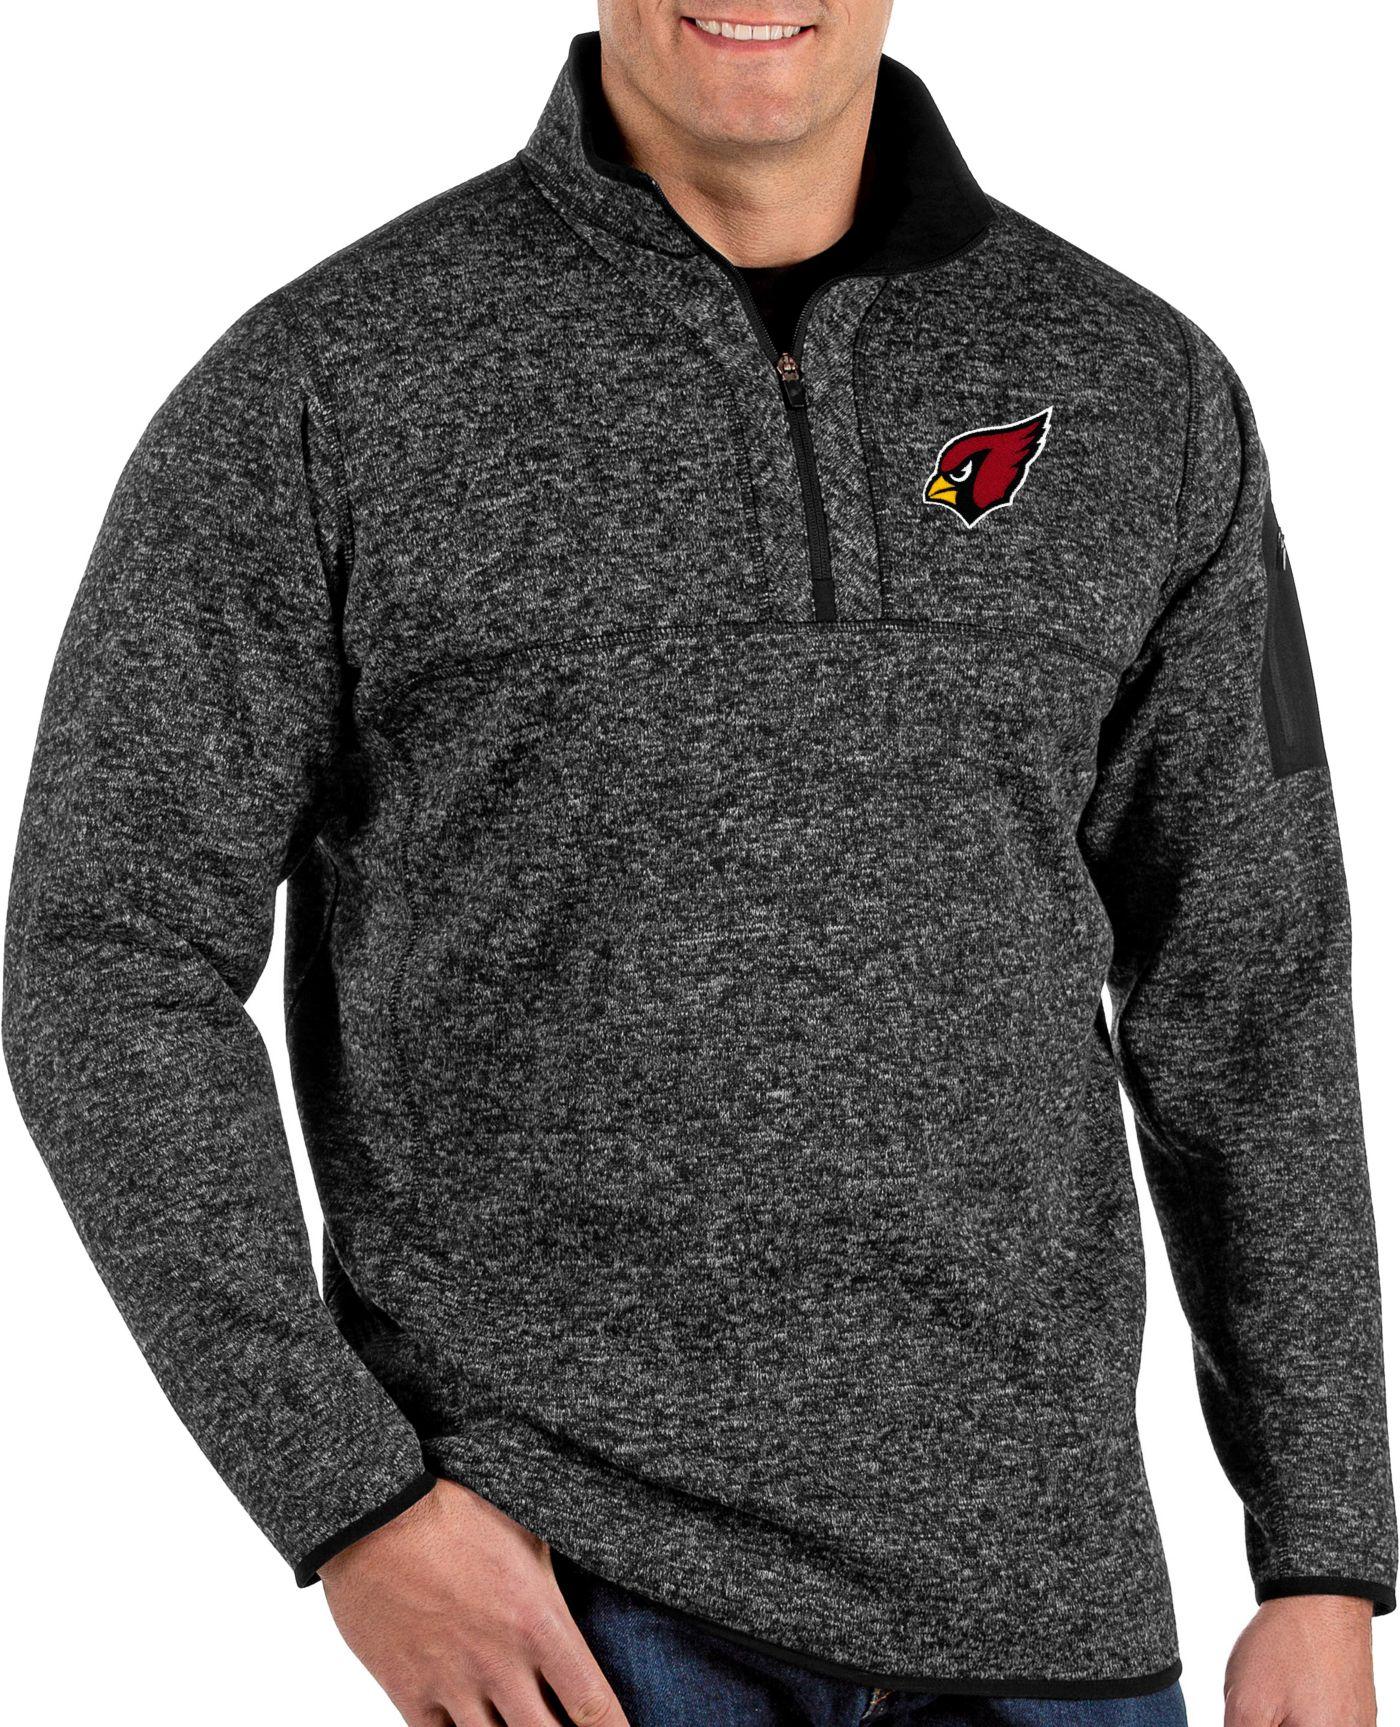 Antigua Men's Arizona Cardinals Fortune Black Pullover Jacket